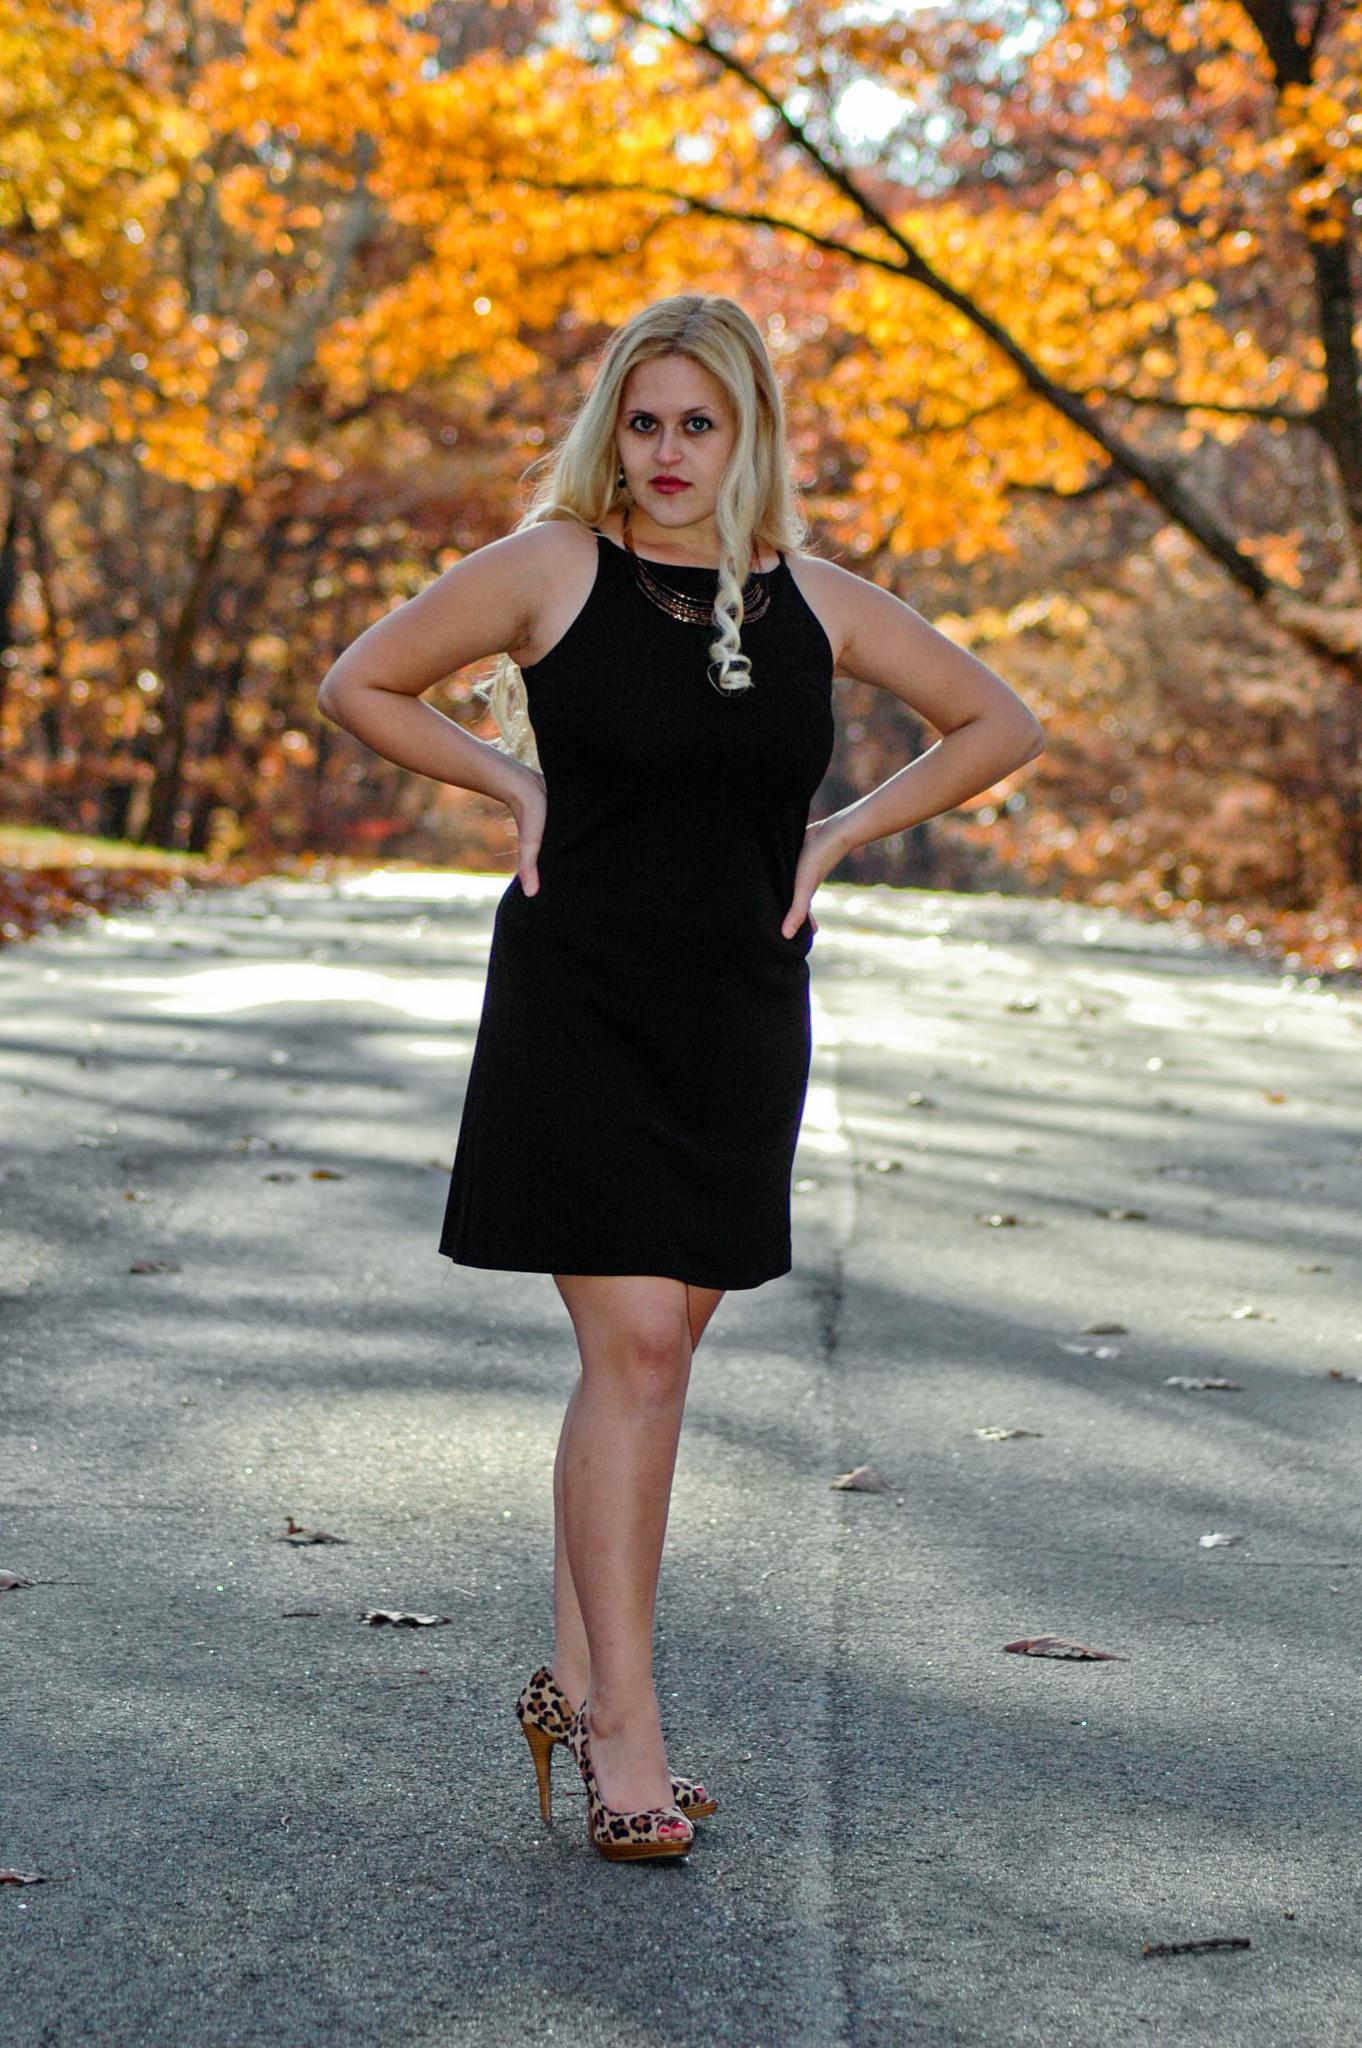 Amber's little black dress by wes.johnson.58